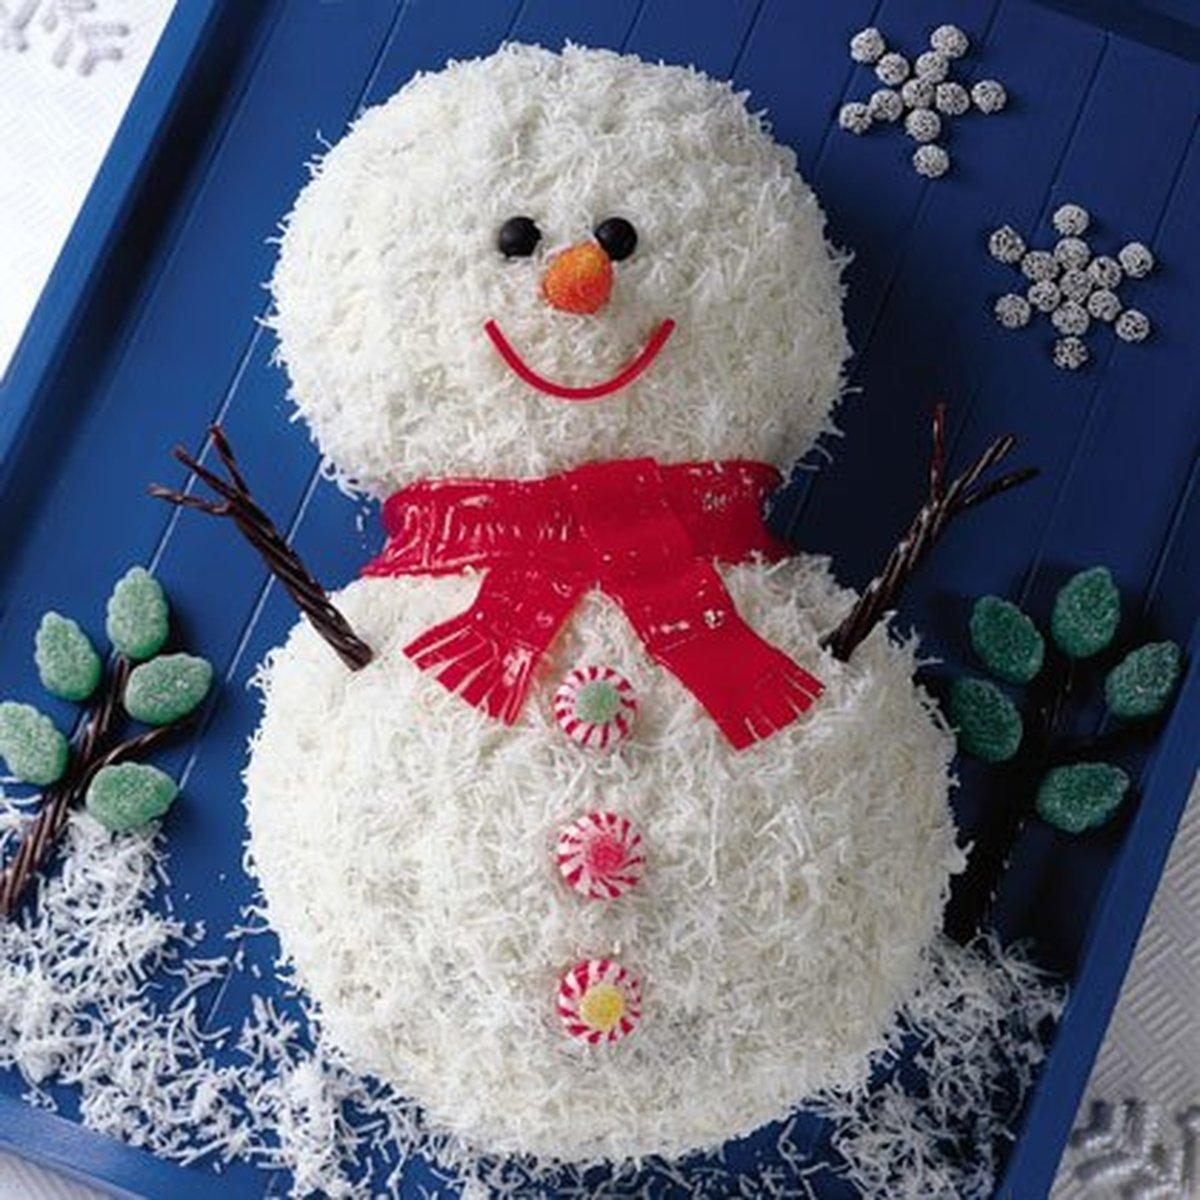 "Как приготовить торт ""Снеговик""? - фото №1"